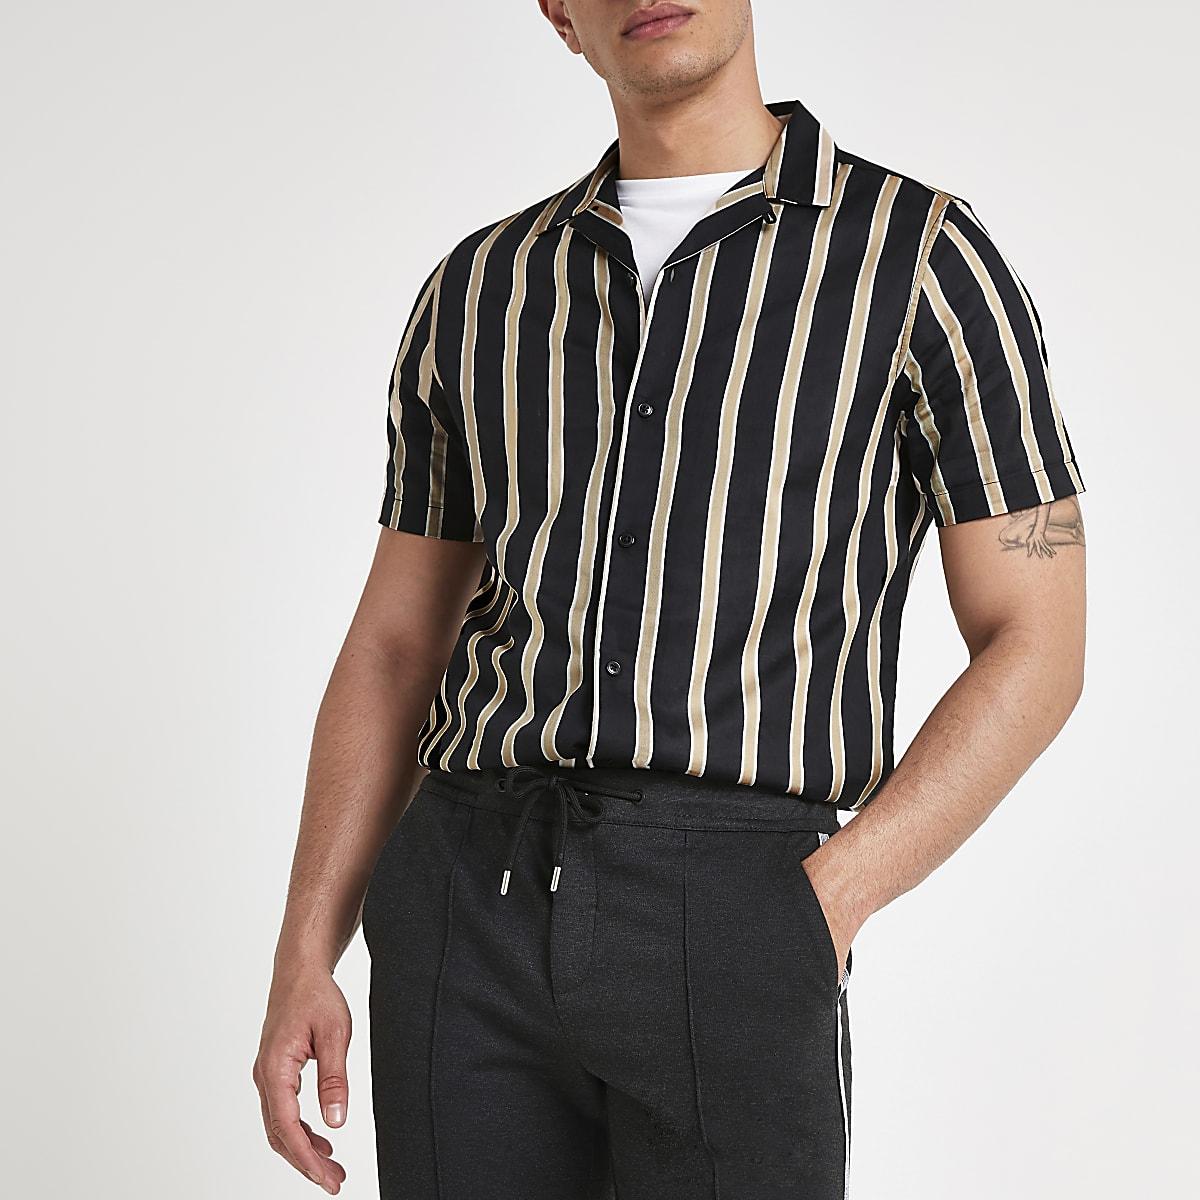 994bef7b75ff1 Black stripe print revere shirt - Short Sleeve Shirts - Shirts - men